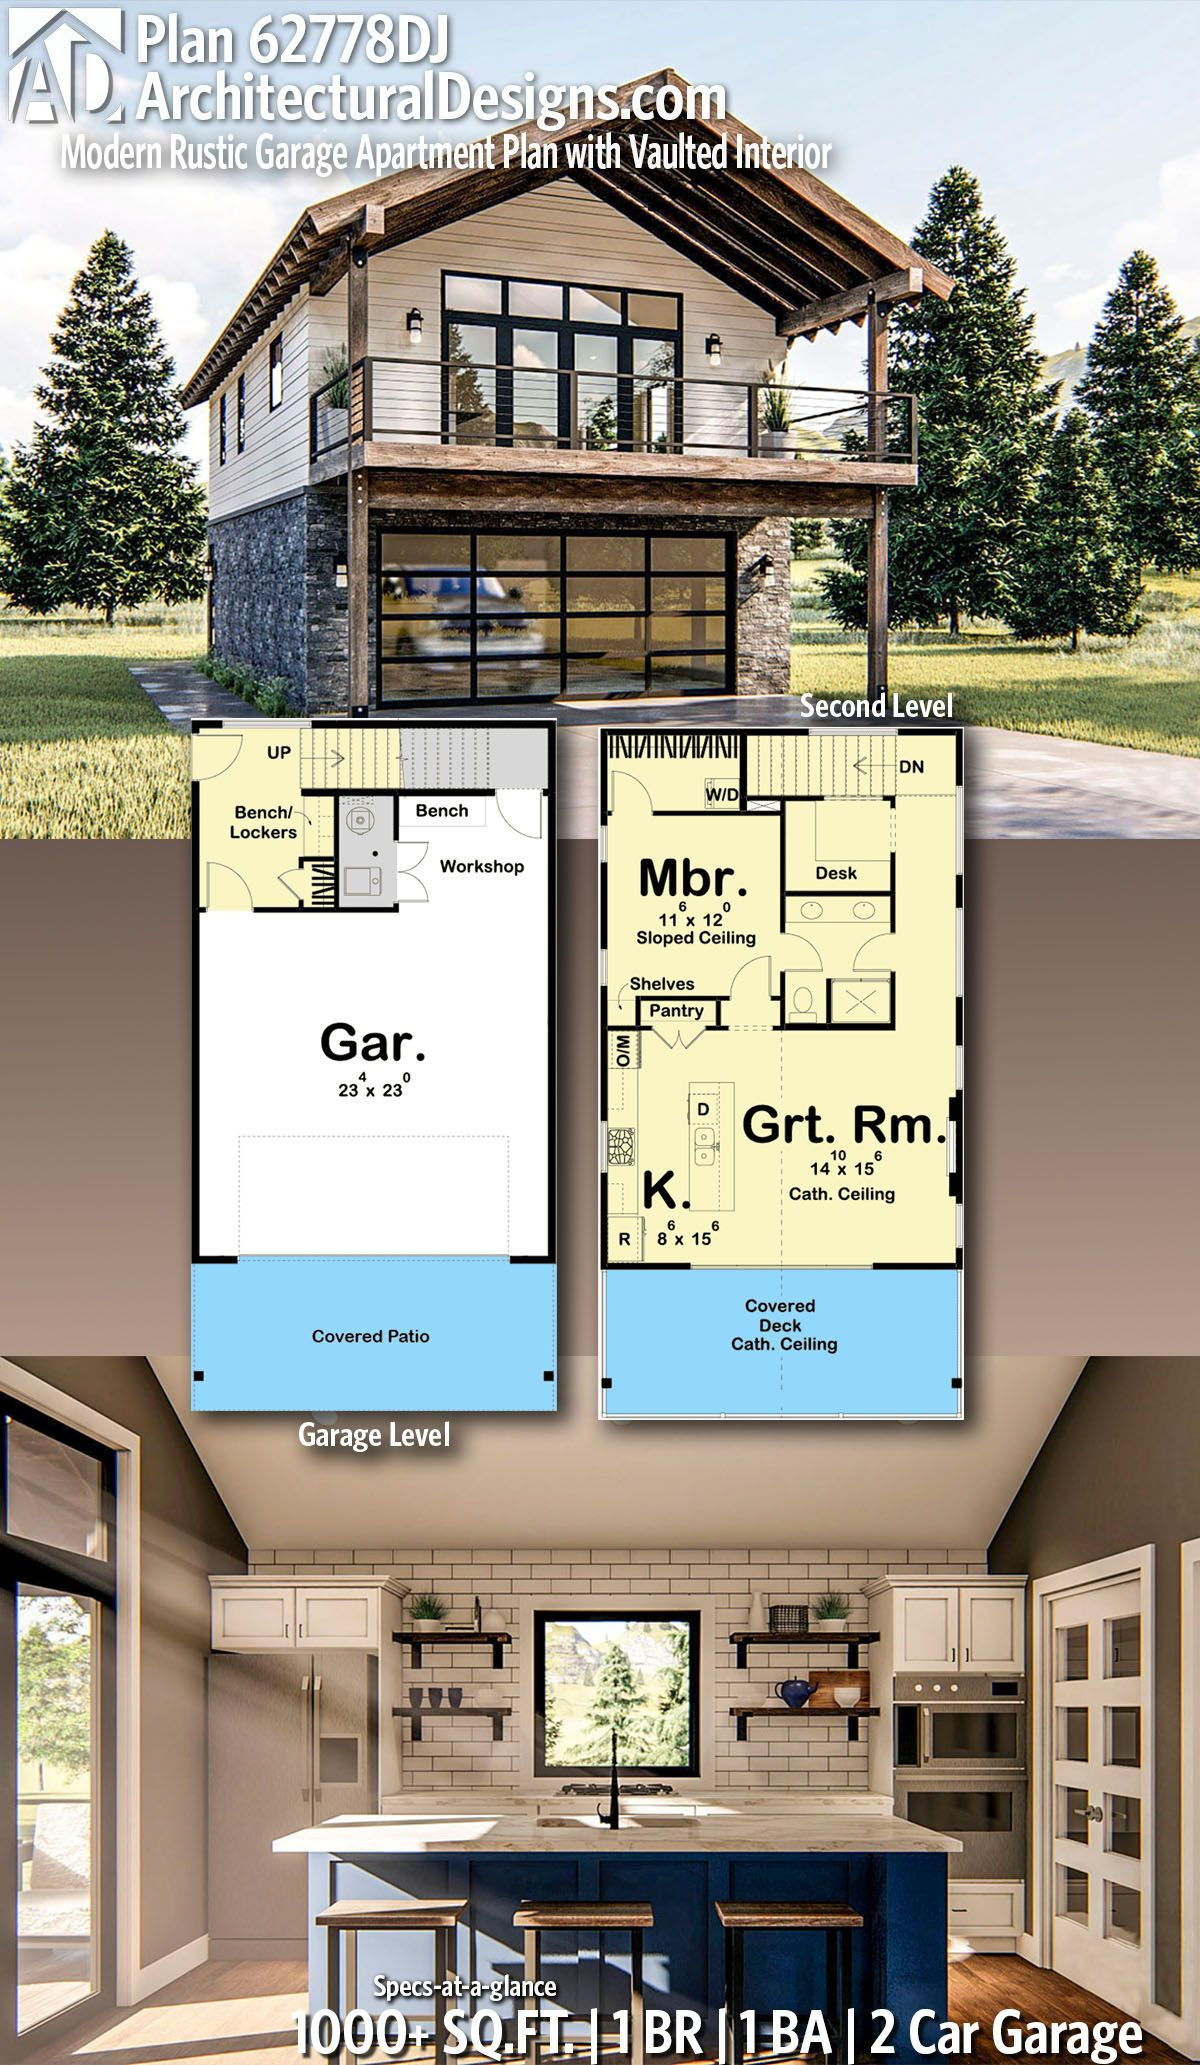 Plan 62778dj Modern Rustic Garage Apartment Plan With Vaulted